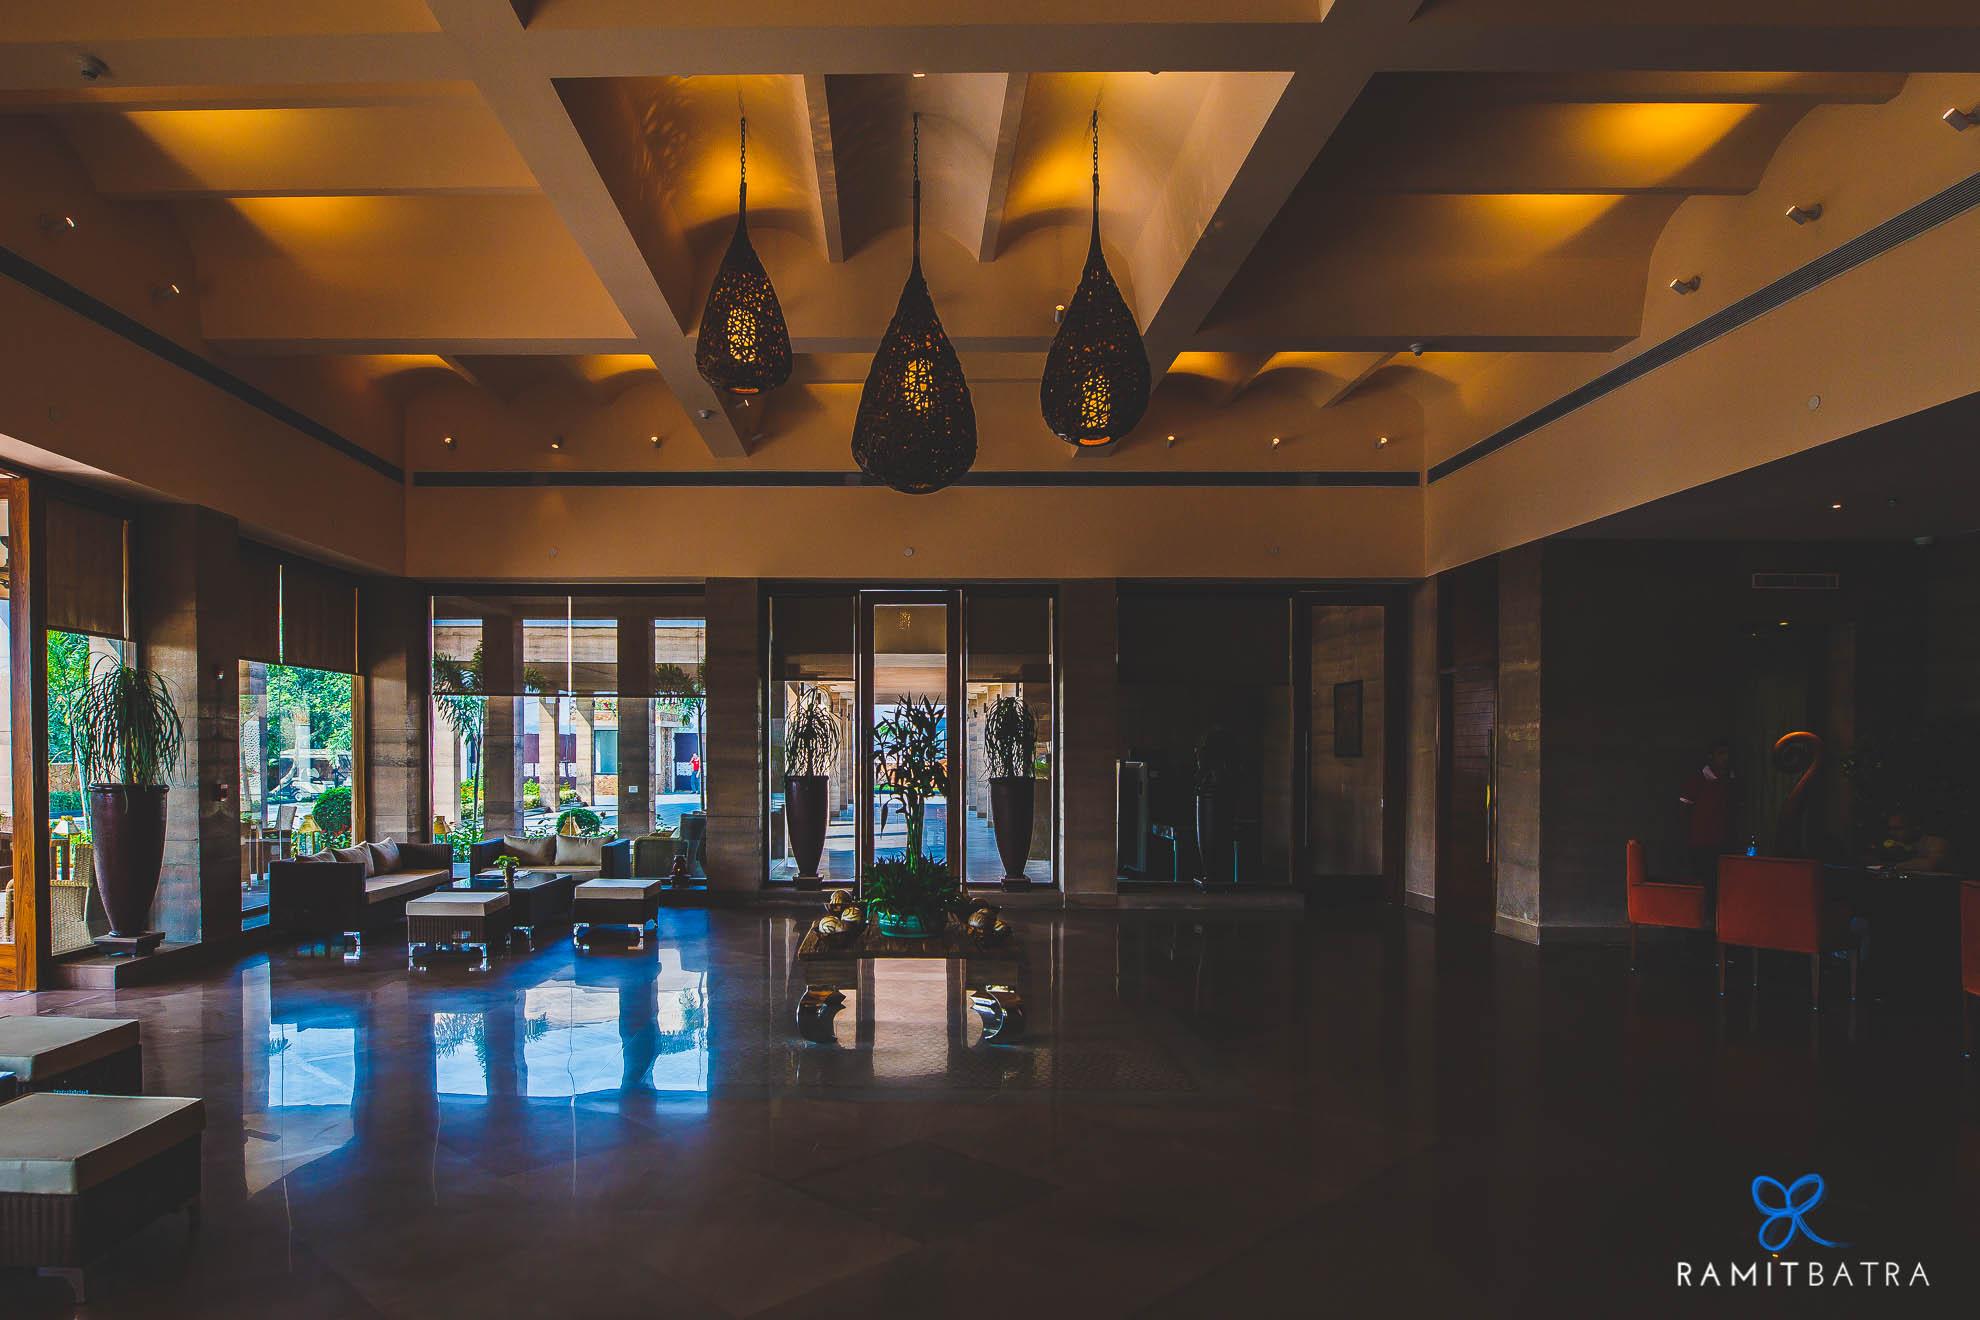 lalit-mangar-hotel-near-delhi-ramitbatra-014